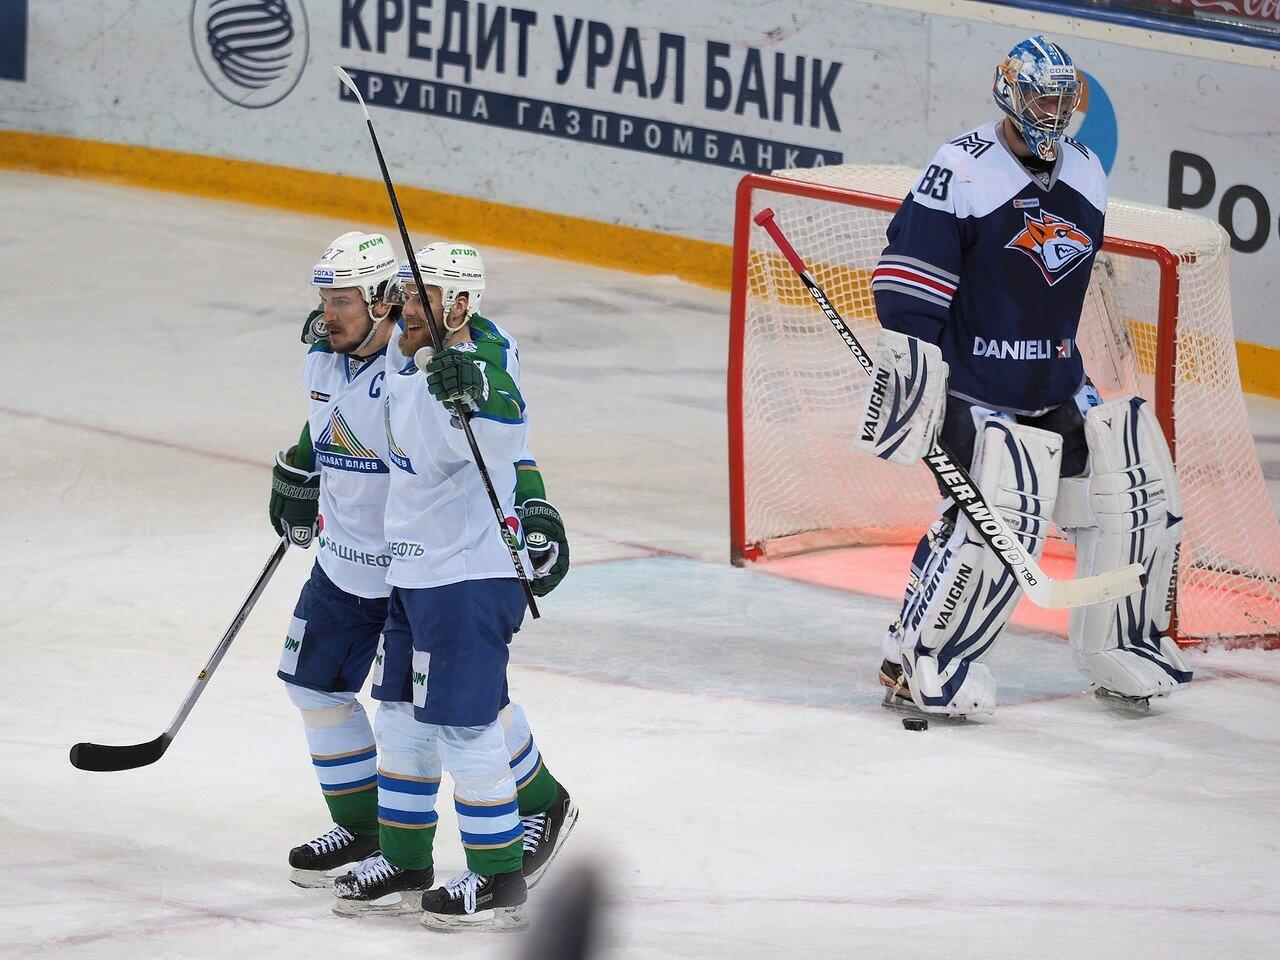 122Плей-офф 2016 Восток Финал Металлург - Салават Юлаев 23.03.2016